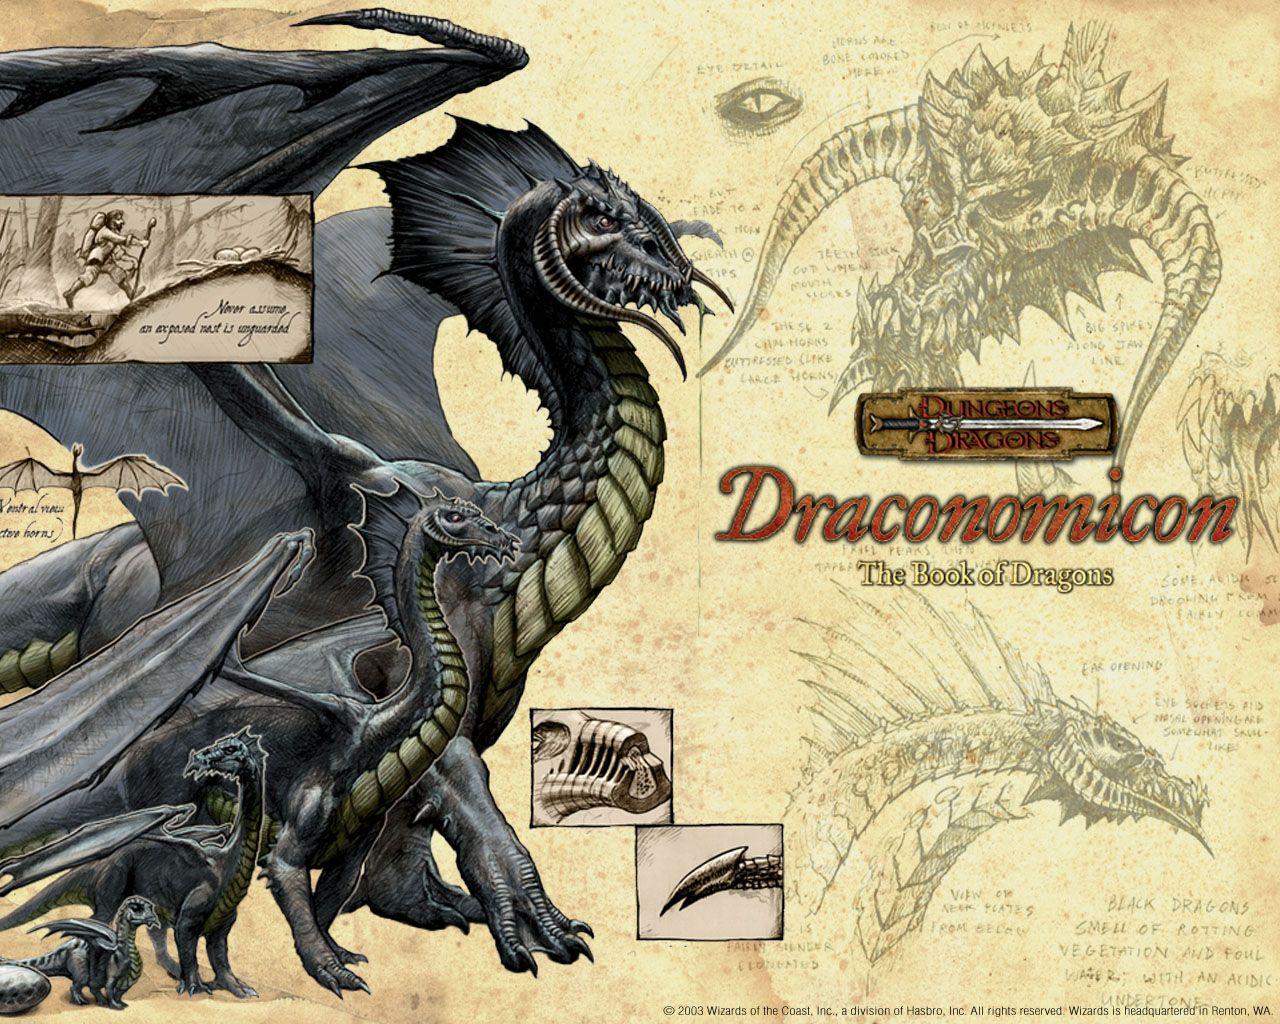 Papel de Parede Dungeons and Dragons Wallpaper para Download no 1280x1024